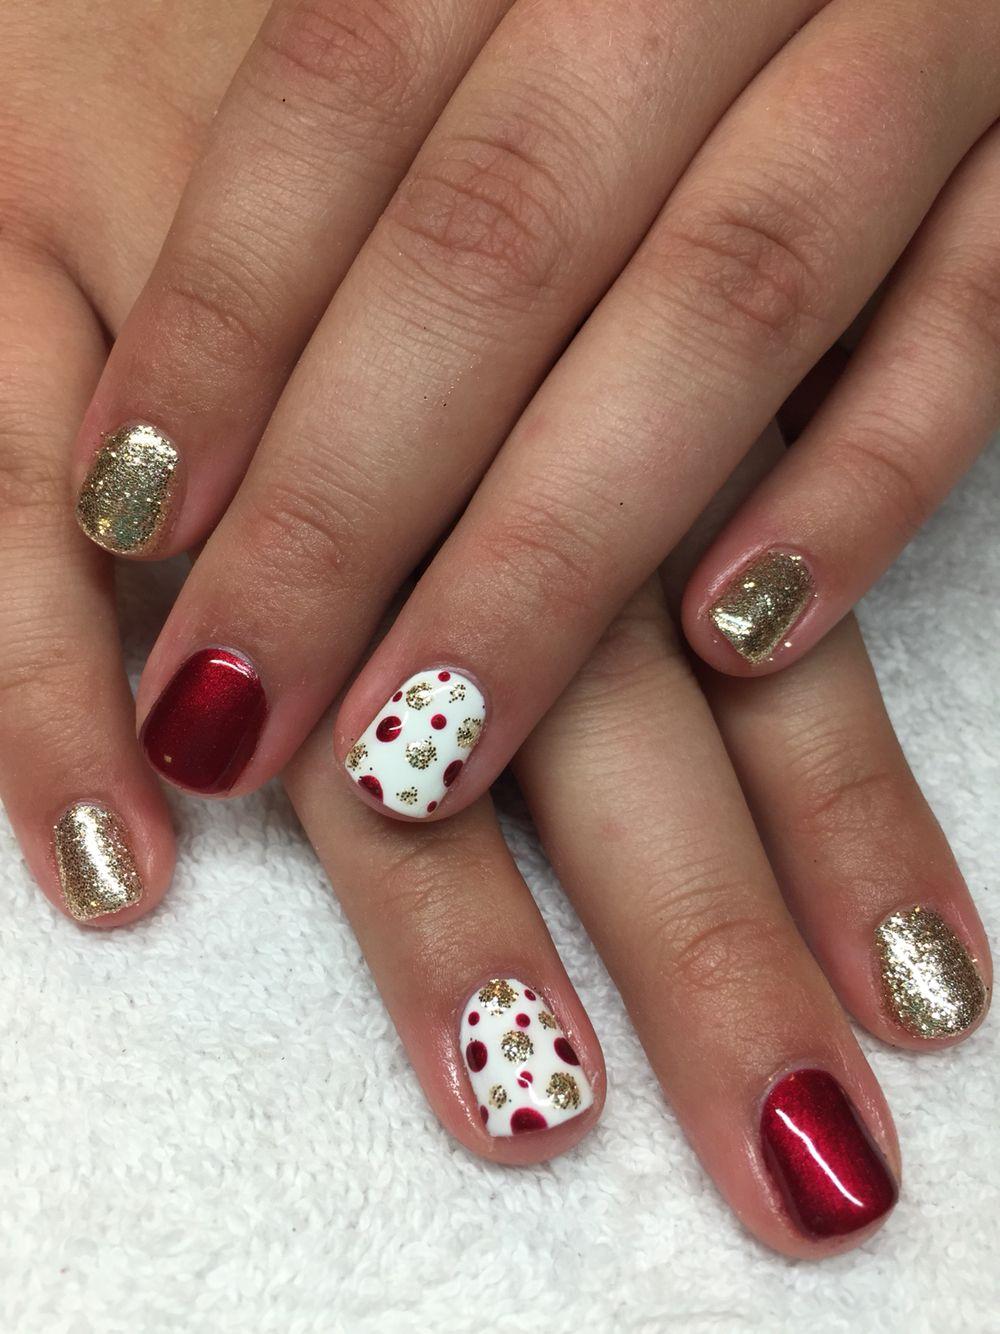 Red and gold polka dot Christmas nails   Christmas nails in 2018 ...